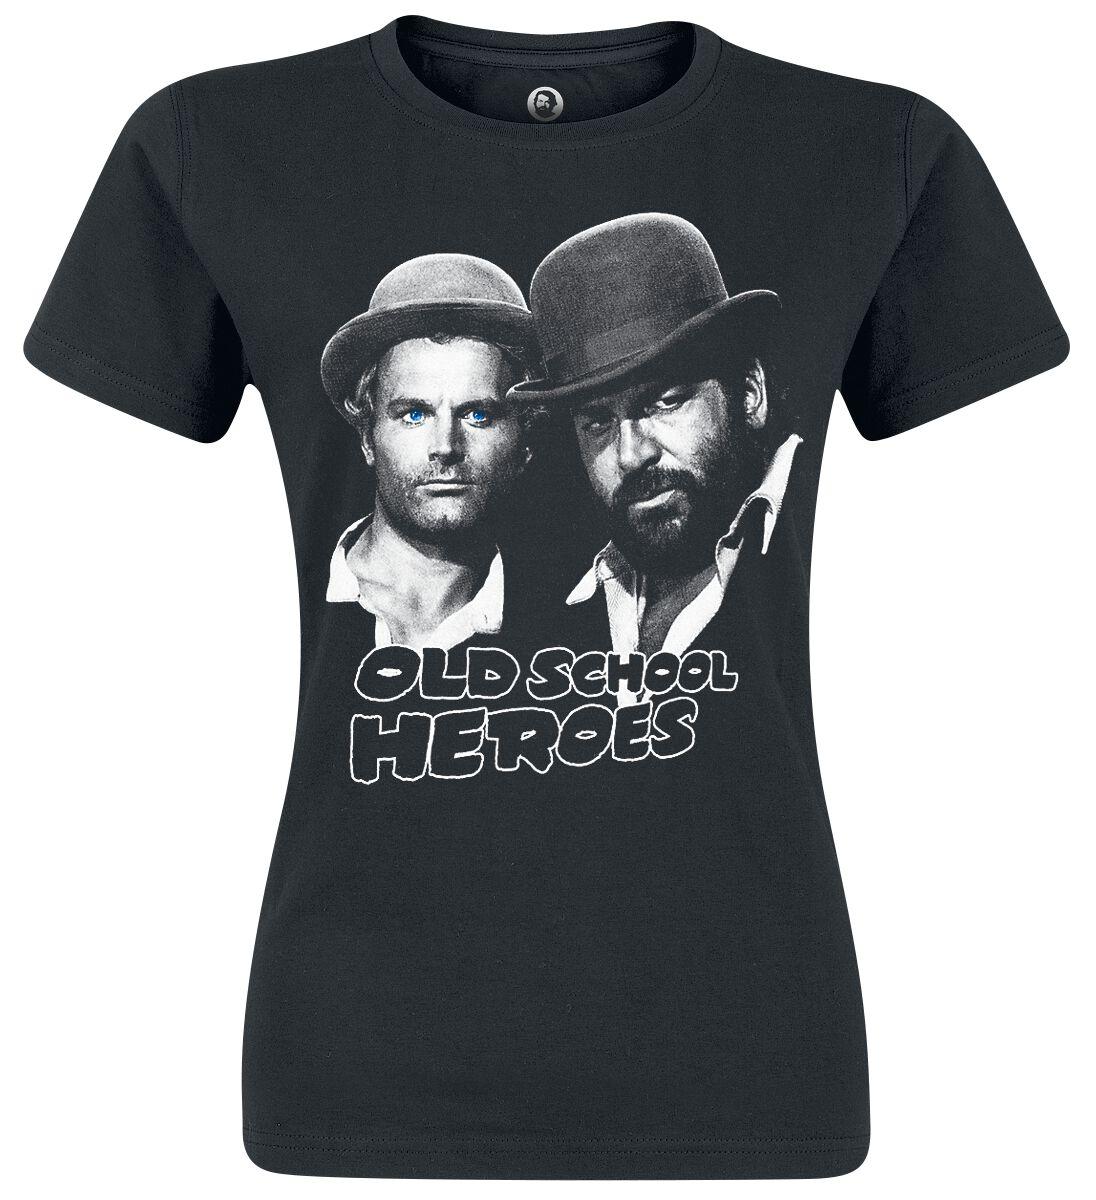 Merch dla Fanów - Koszulki - Koszulka damska Bud Spencer Oldschool Heroes Koszulka damska czarny - 340587